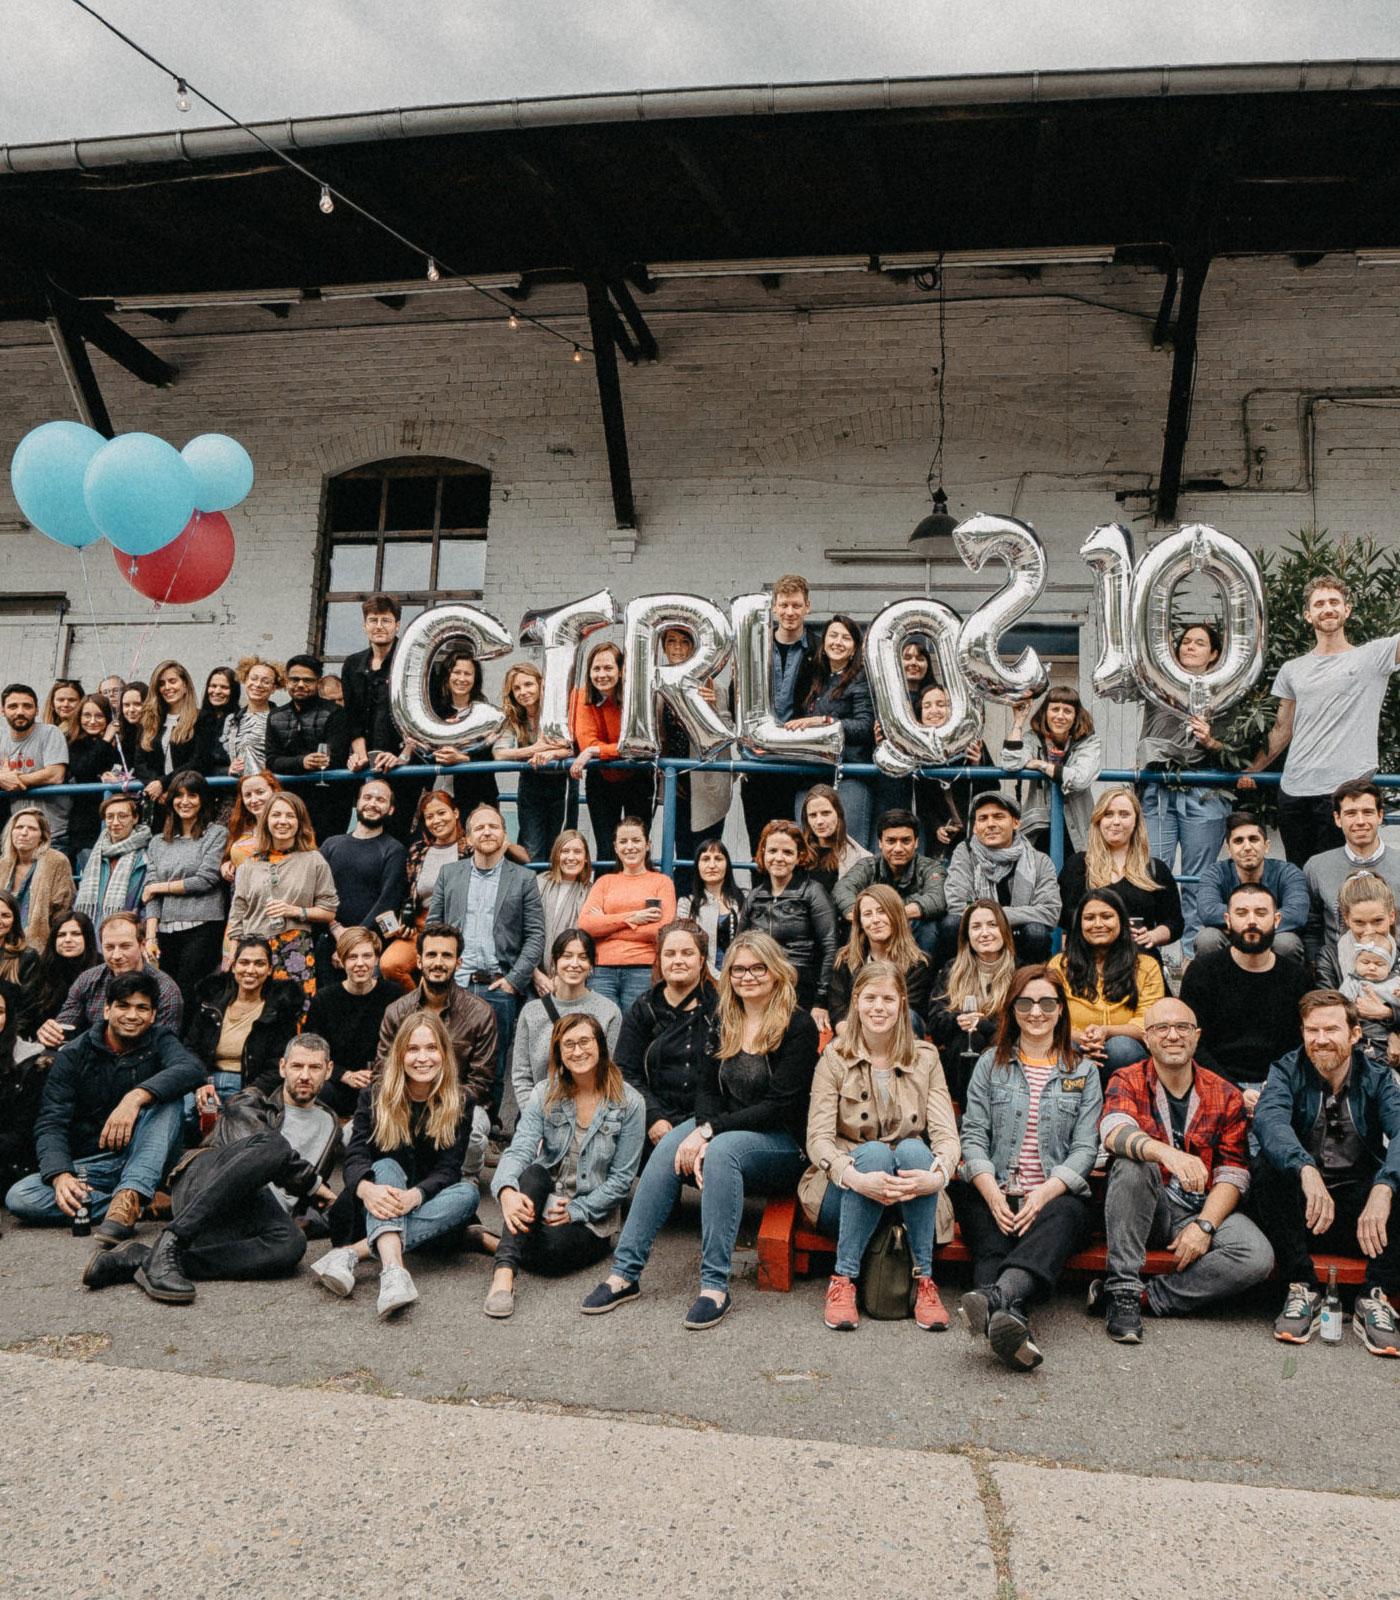 ctrl QS team photo during 10 year anniversary celebrations